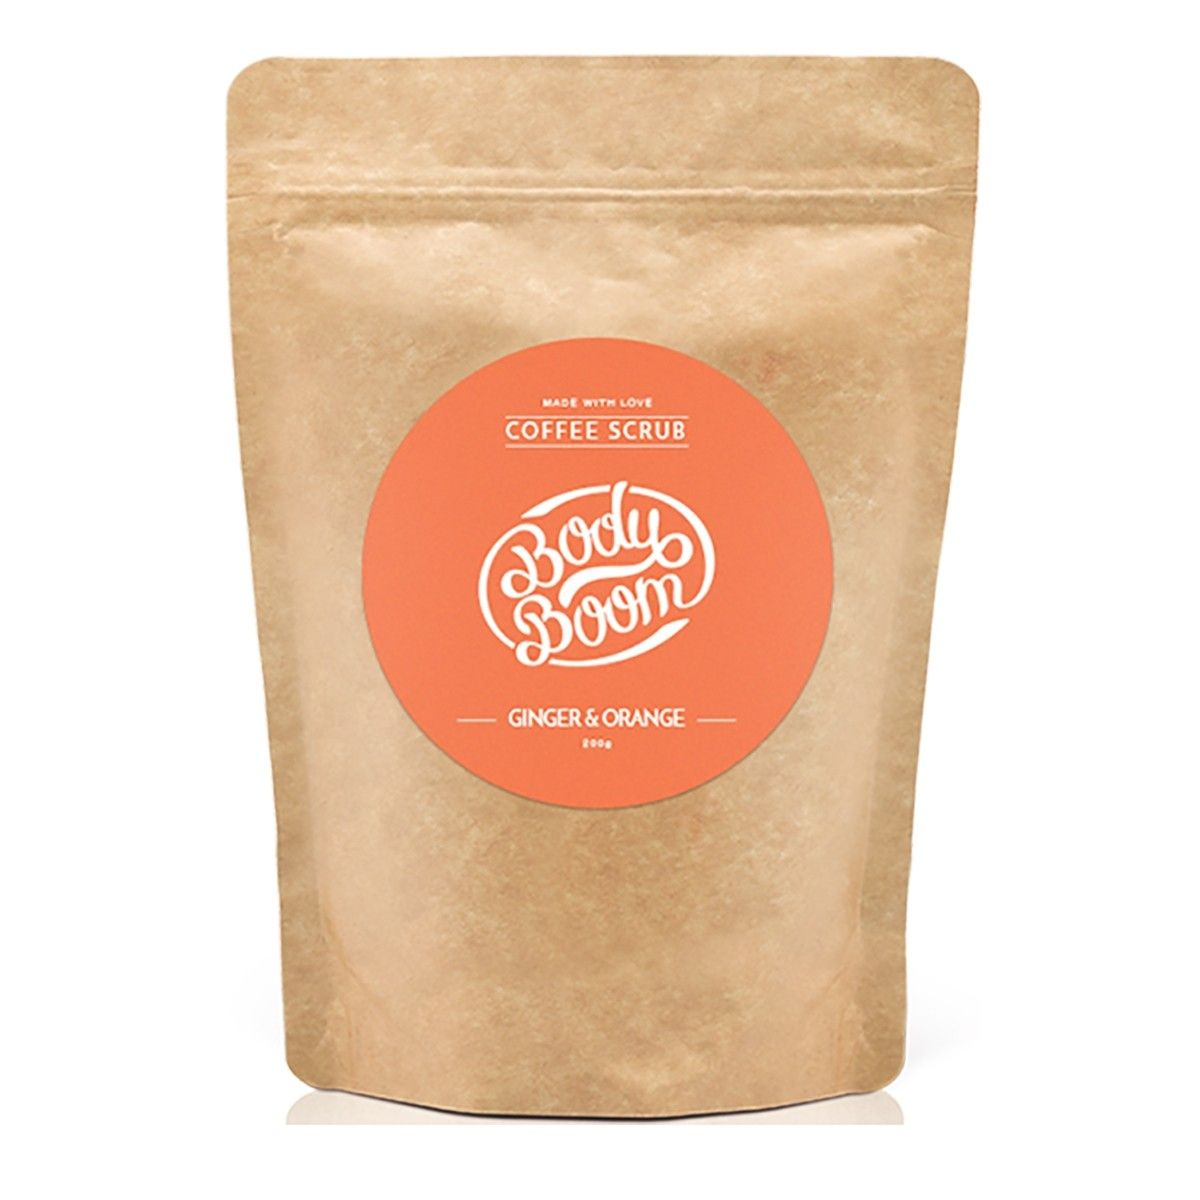 Afbeelding van Bodyboom Coffee Scrub Ginger&Orange Bodyscrub Beauty